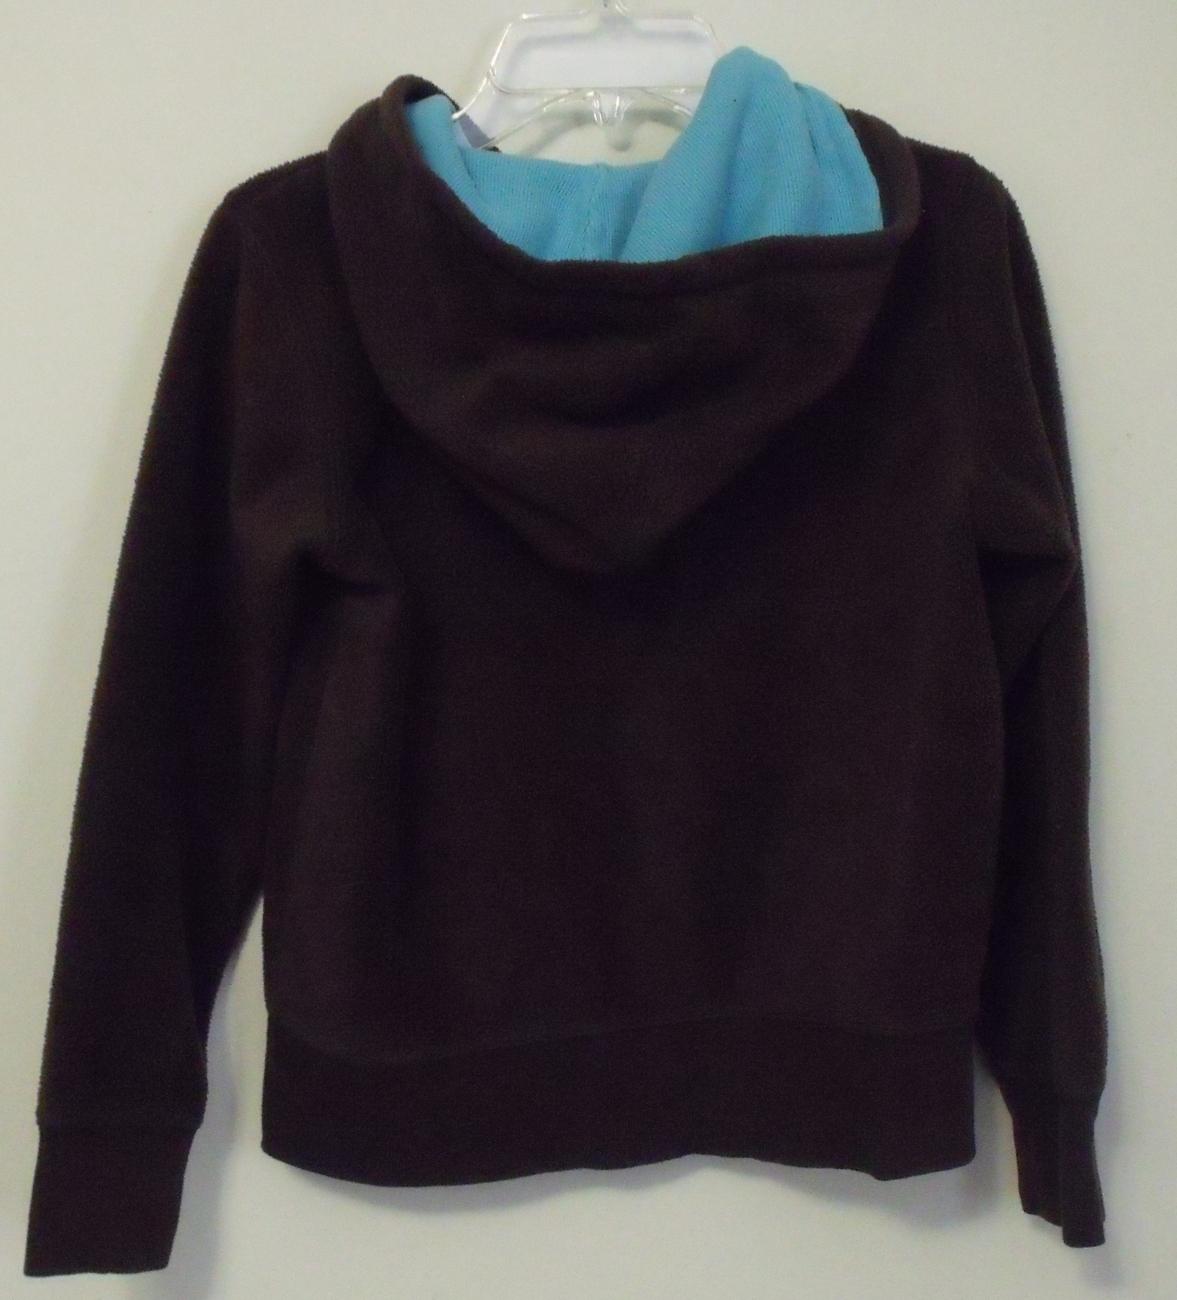 Girls Gap Kids Brown with Aqua trim Fleece Hooded Long Sleeve Jacket Size M  image 2